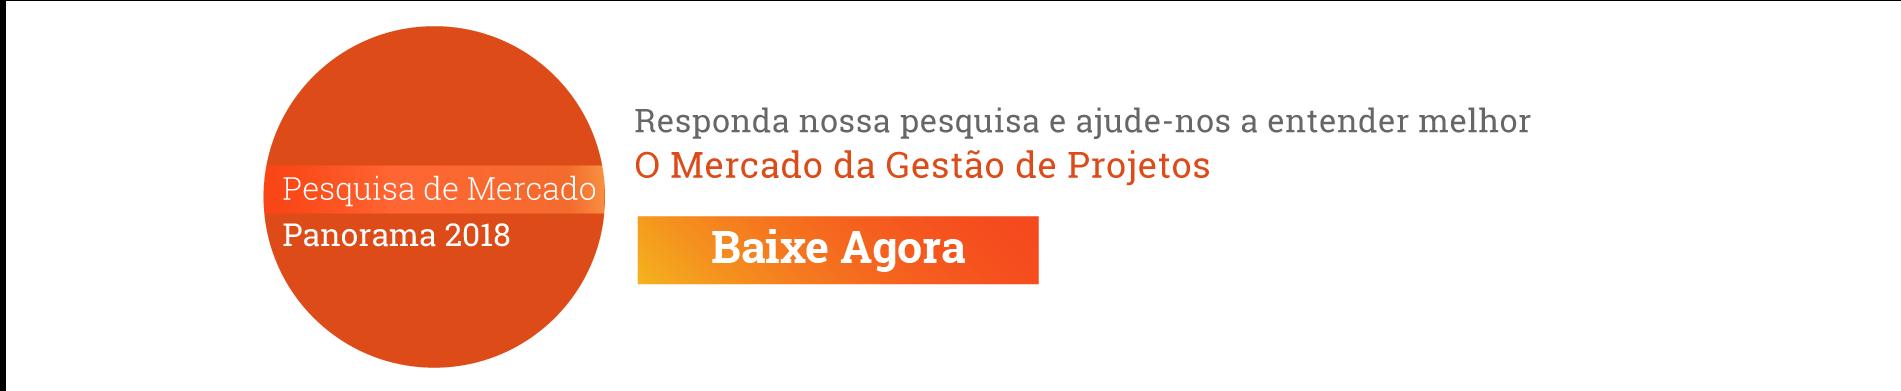 https://www.mestregp.com.br/wp-content/uploads/2019/02/Ajusta-pag-pesquisa-02-1901x391.png